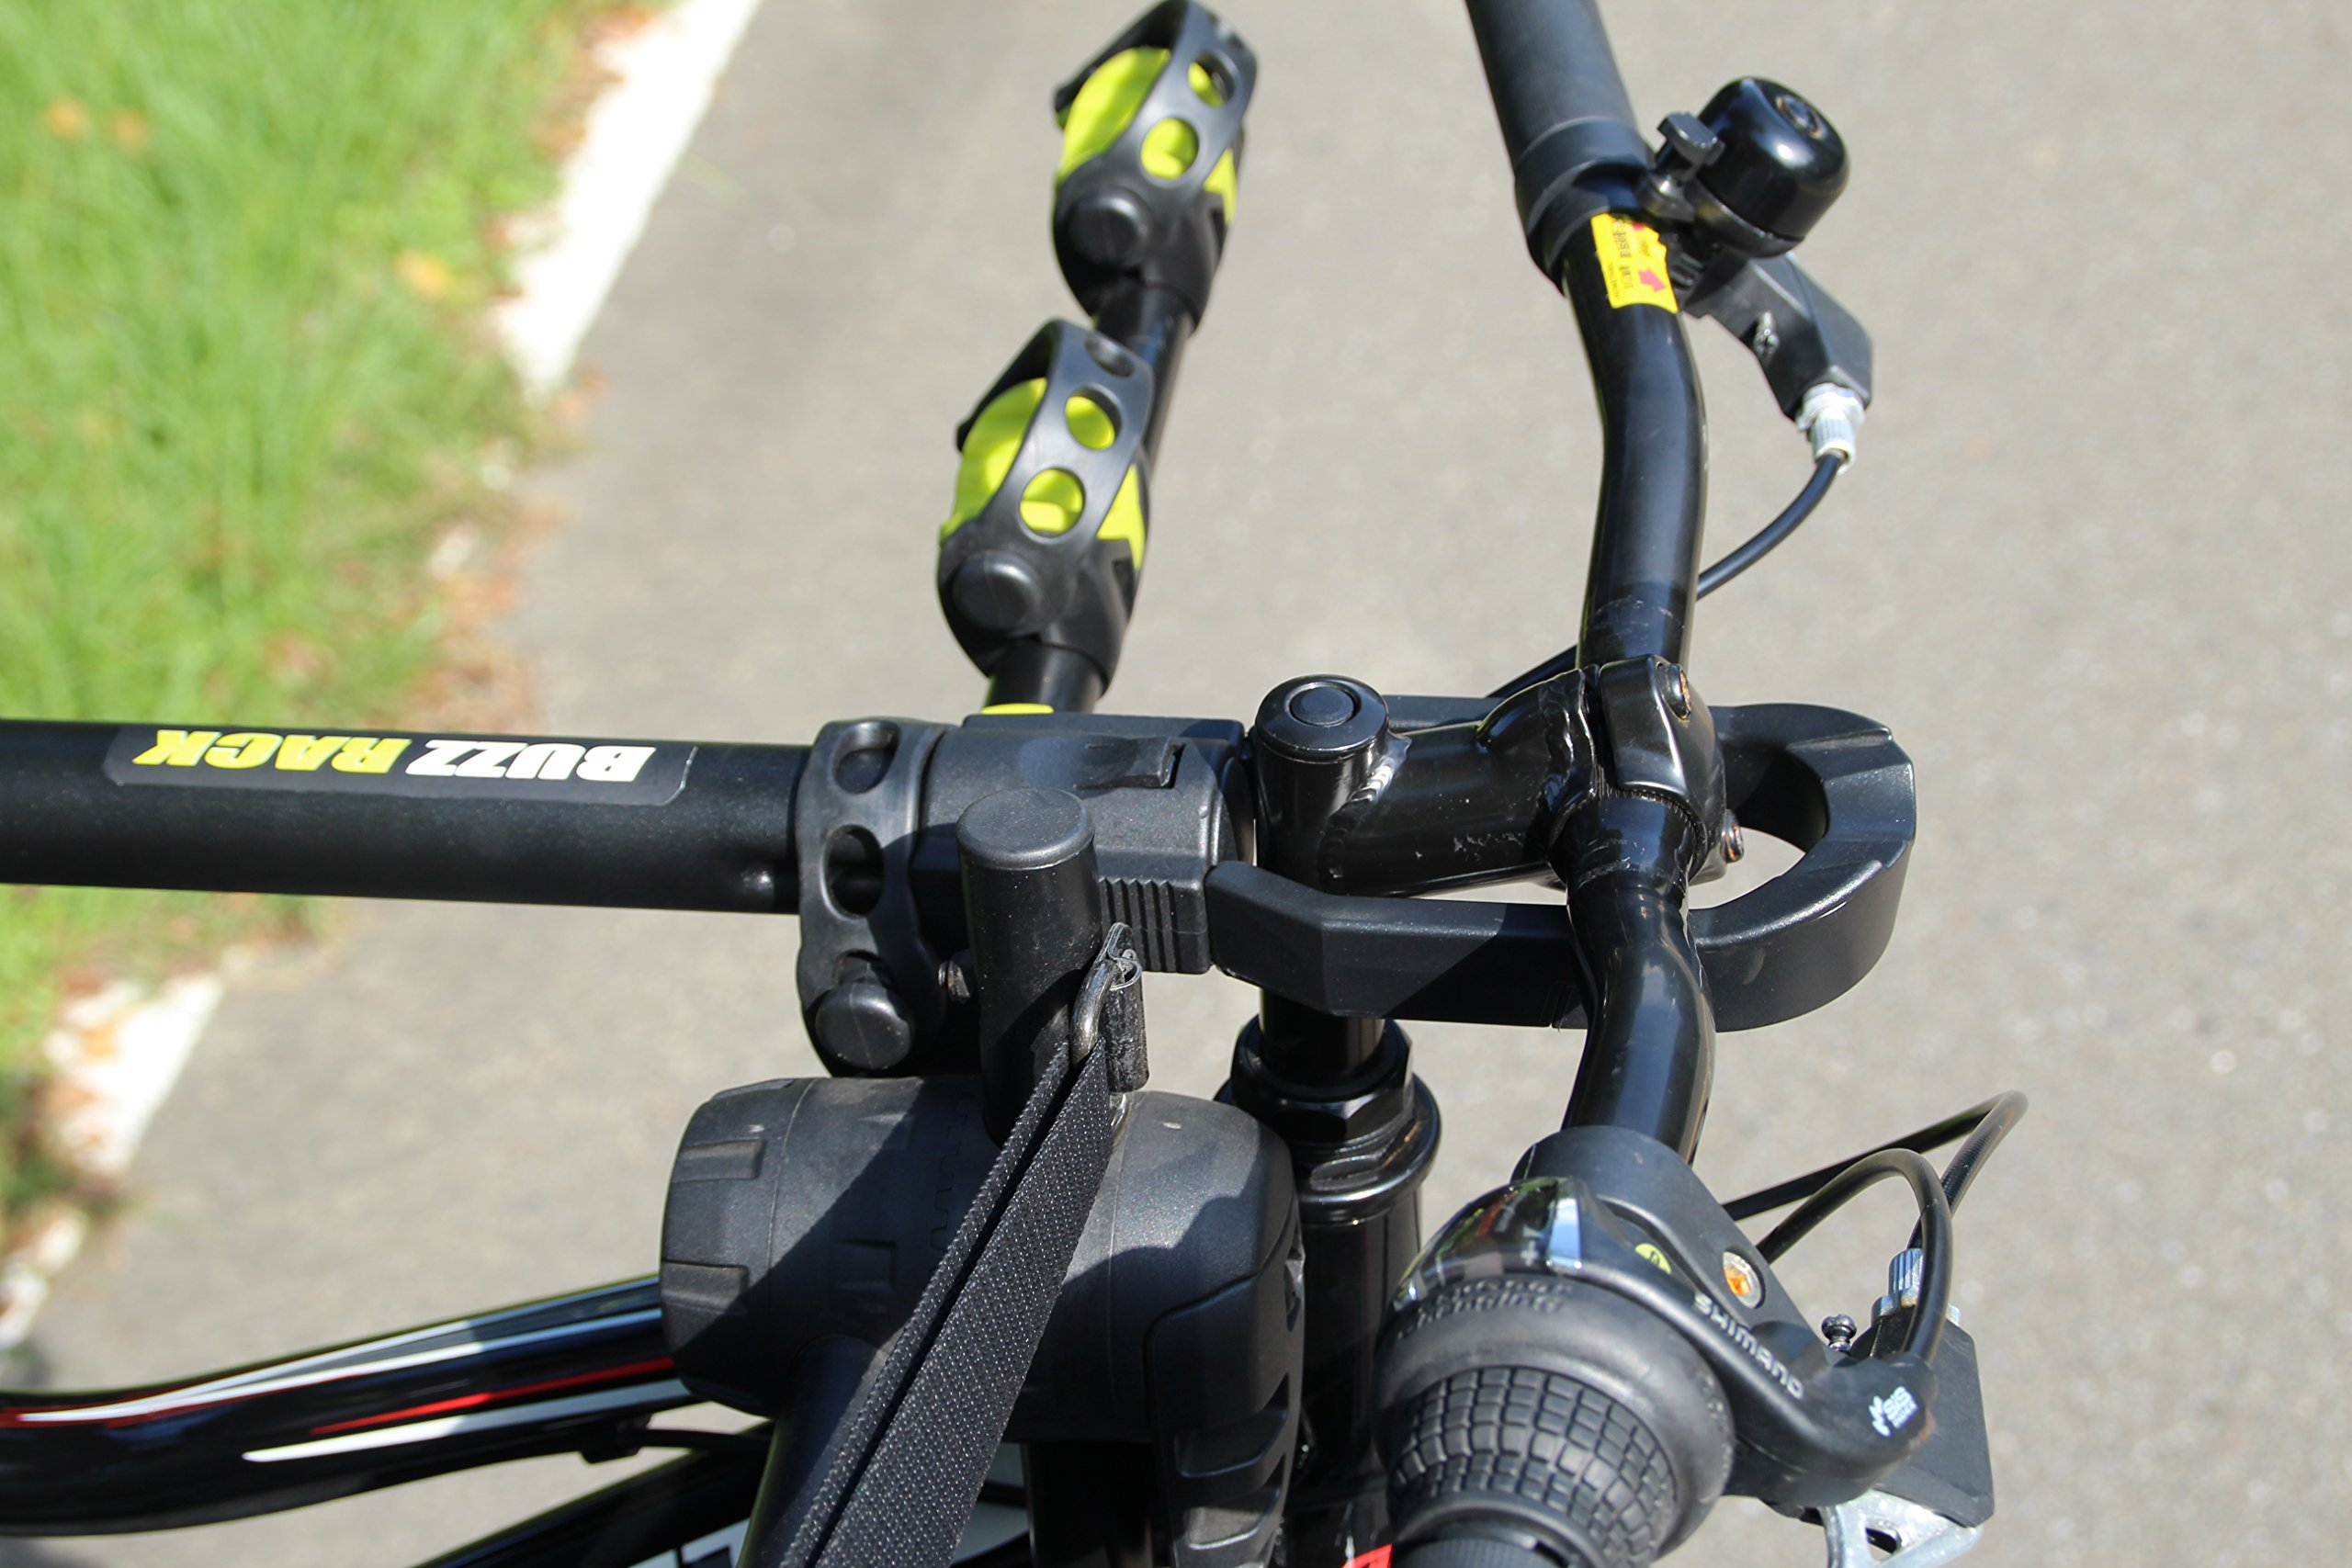 BUZZ RACK GRIP Deluxe Black Bike Top Frame Cross Bar Telescopic Adaptor by BUZZ RACK (Image #6)